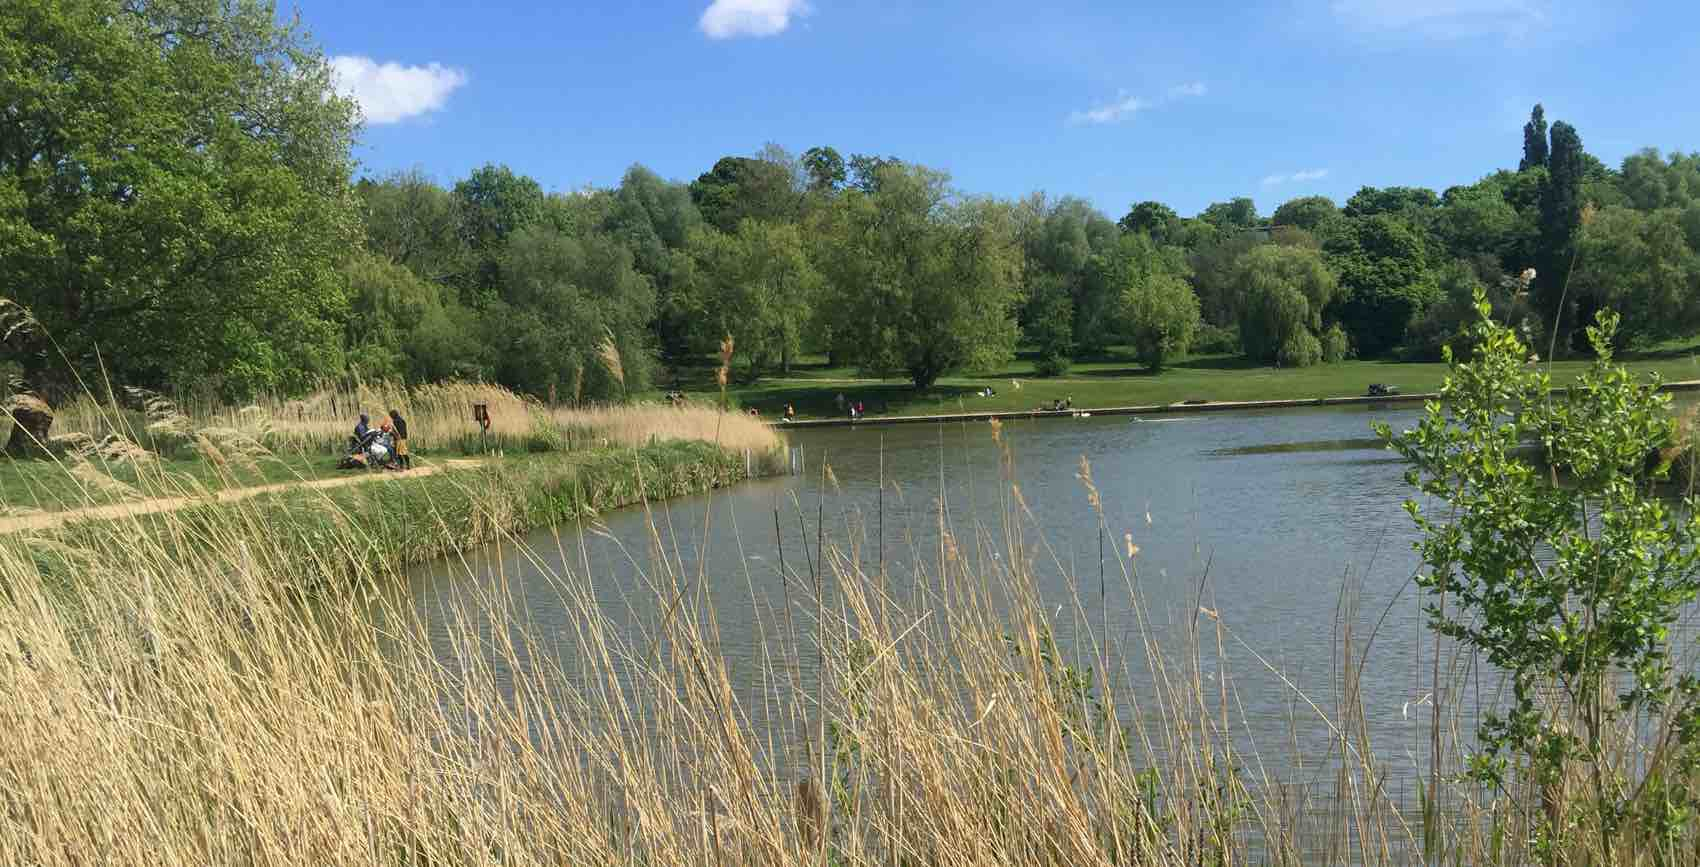 The park Hampstead Heath in North London